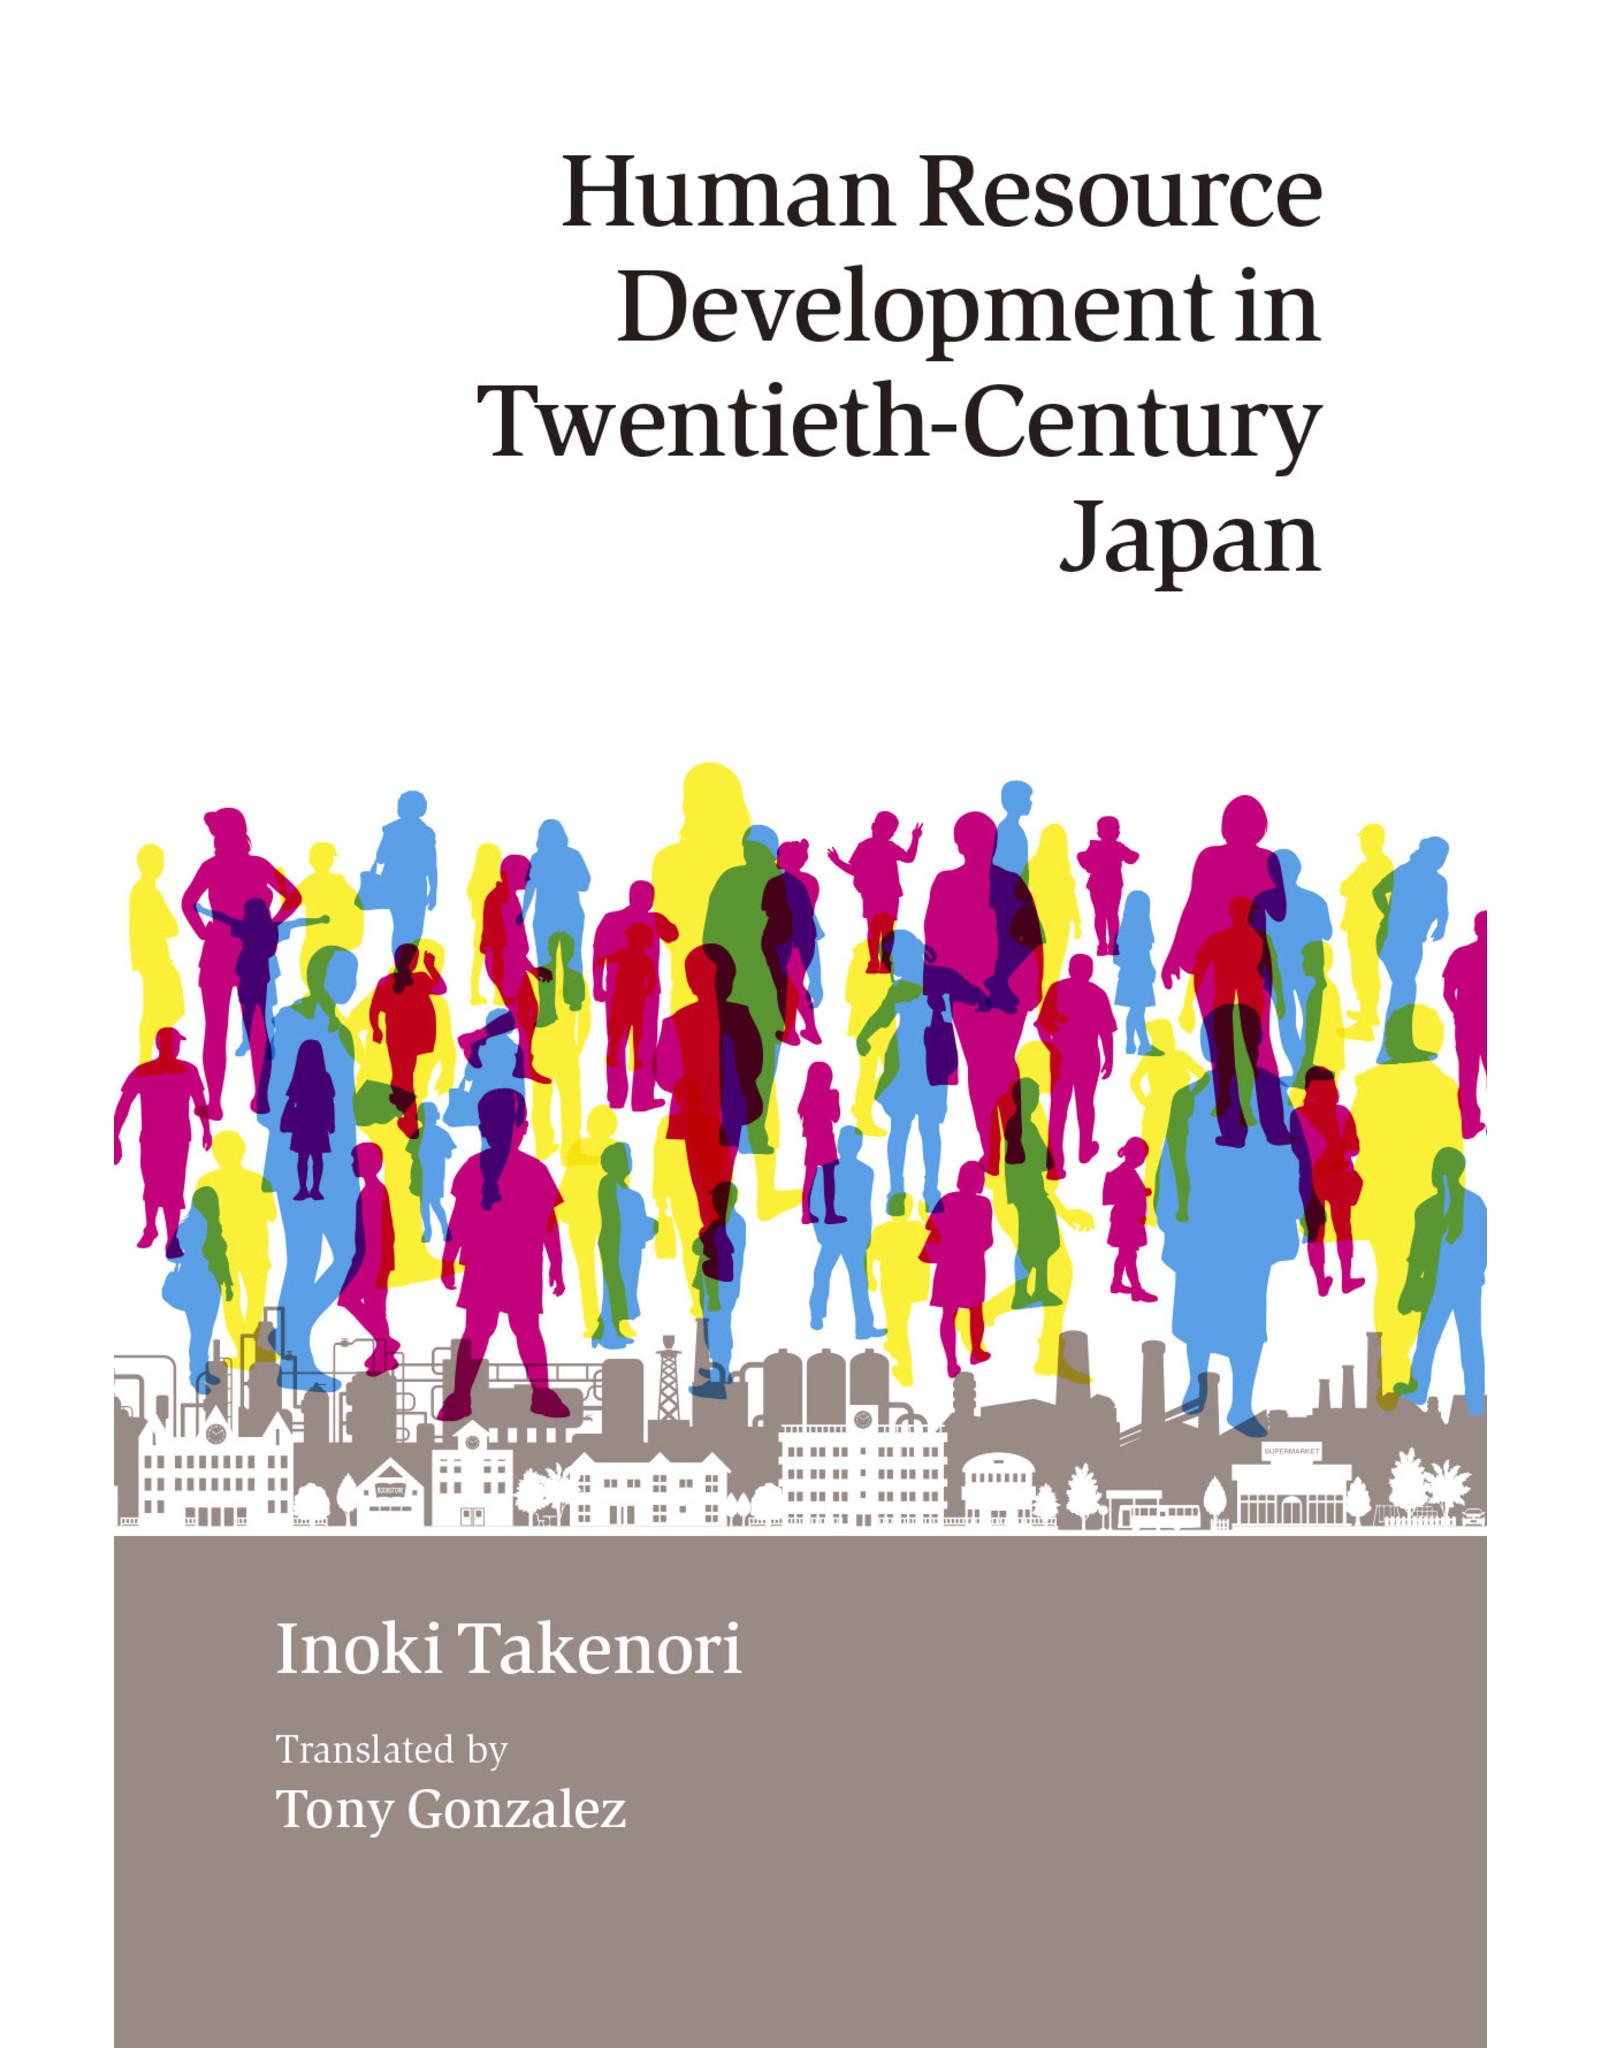 JPIC Human Resource Development in Twentieth-Century Japan